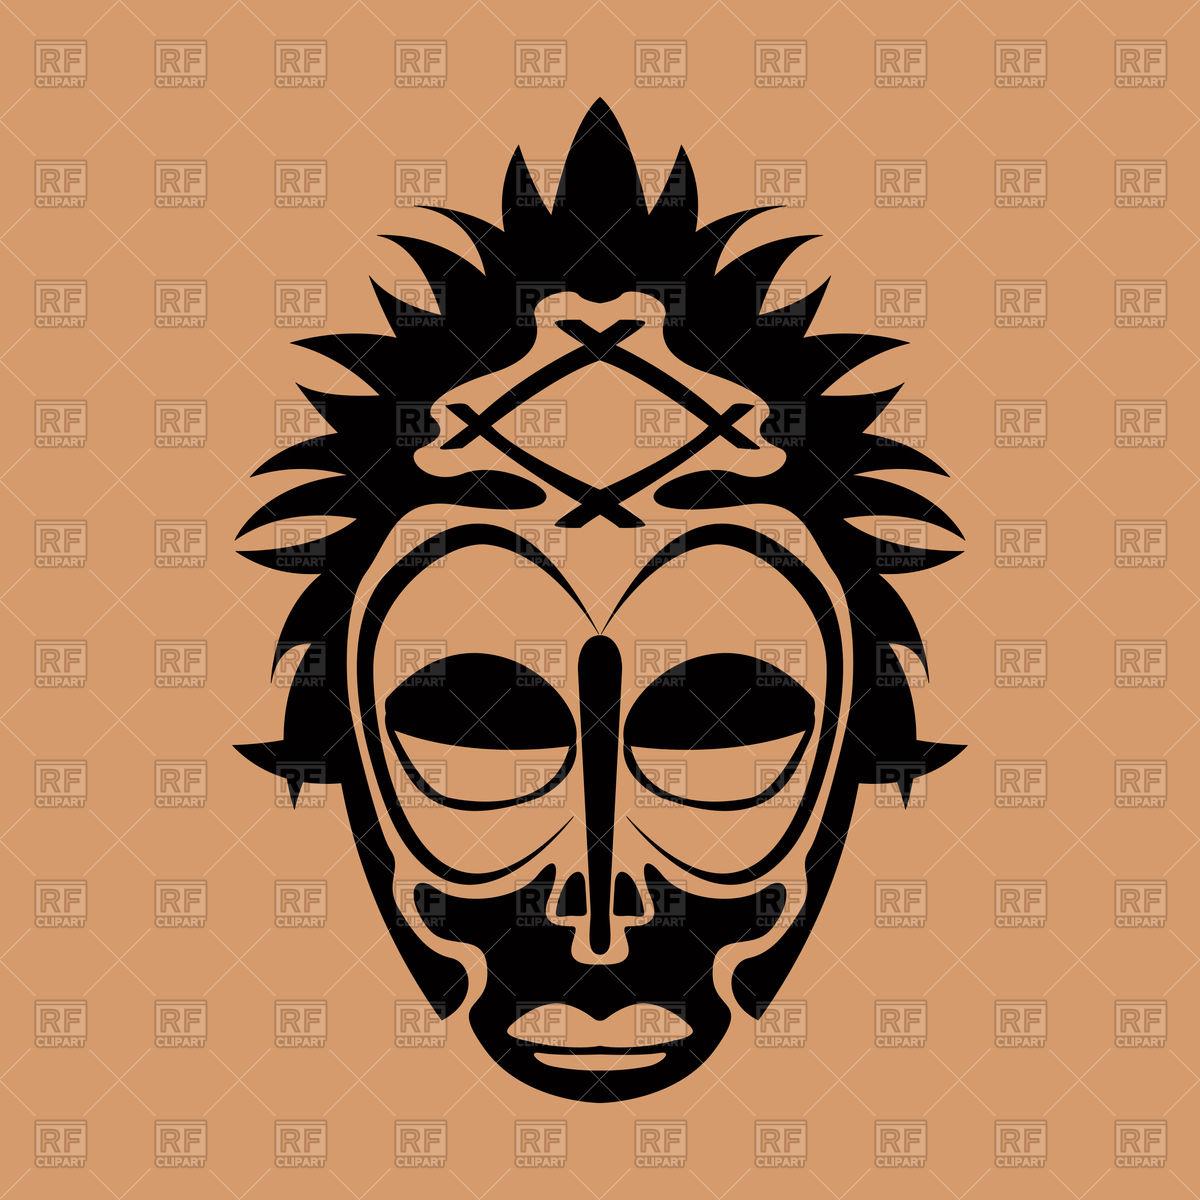 1200x1200 Tribal Mask Design, Abstract Art Royalty Free Vector Clip Art